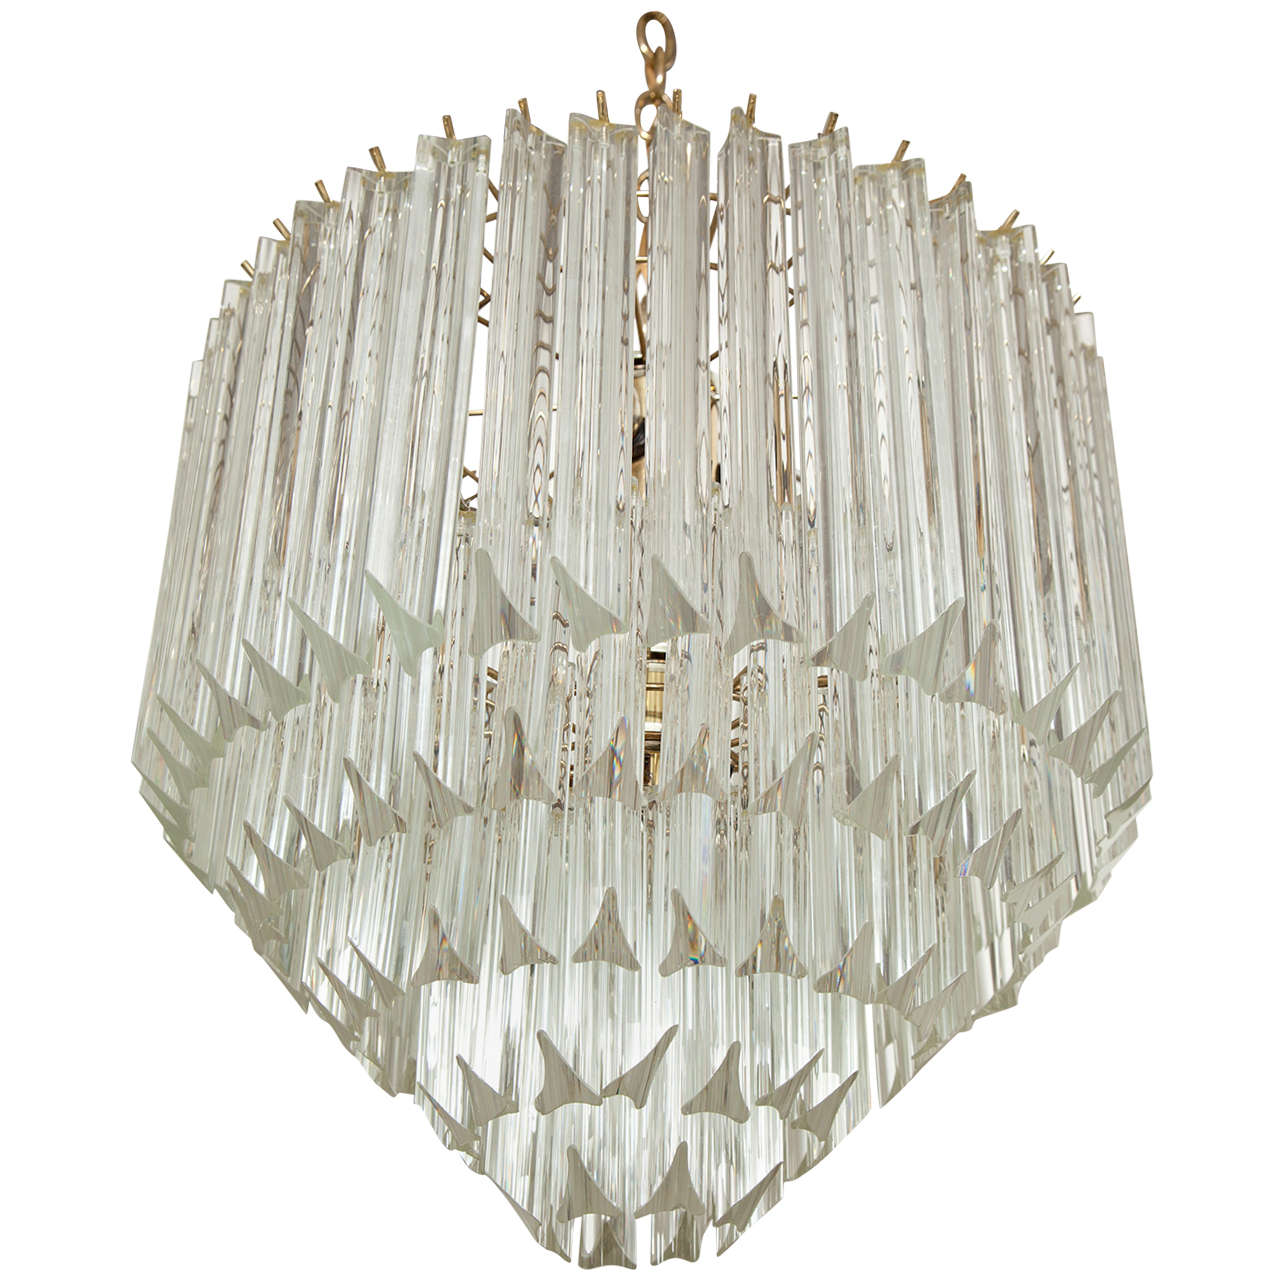 Five tier crystal prism chandelierflush mount by camer for sale at five tier crystal prism chandelierflush mount by camer for sale arubaitofo Choice Image